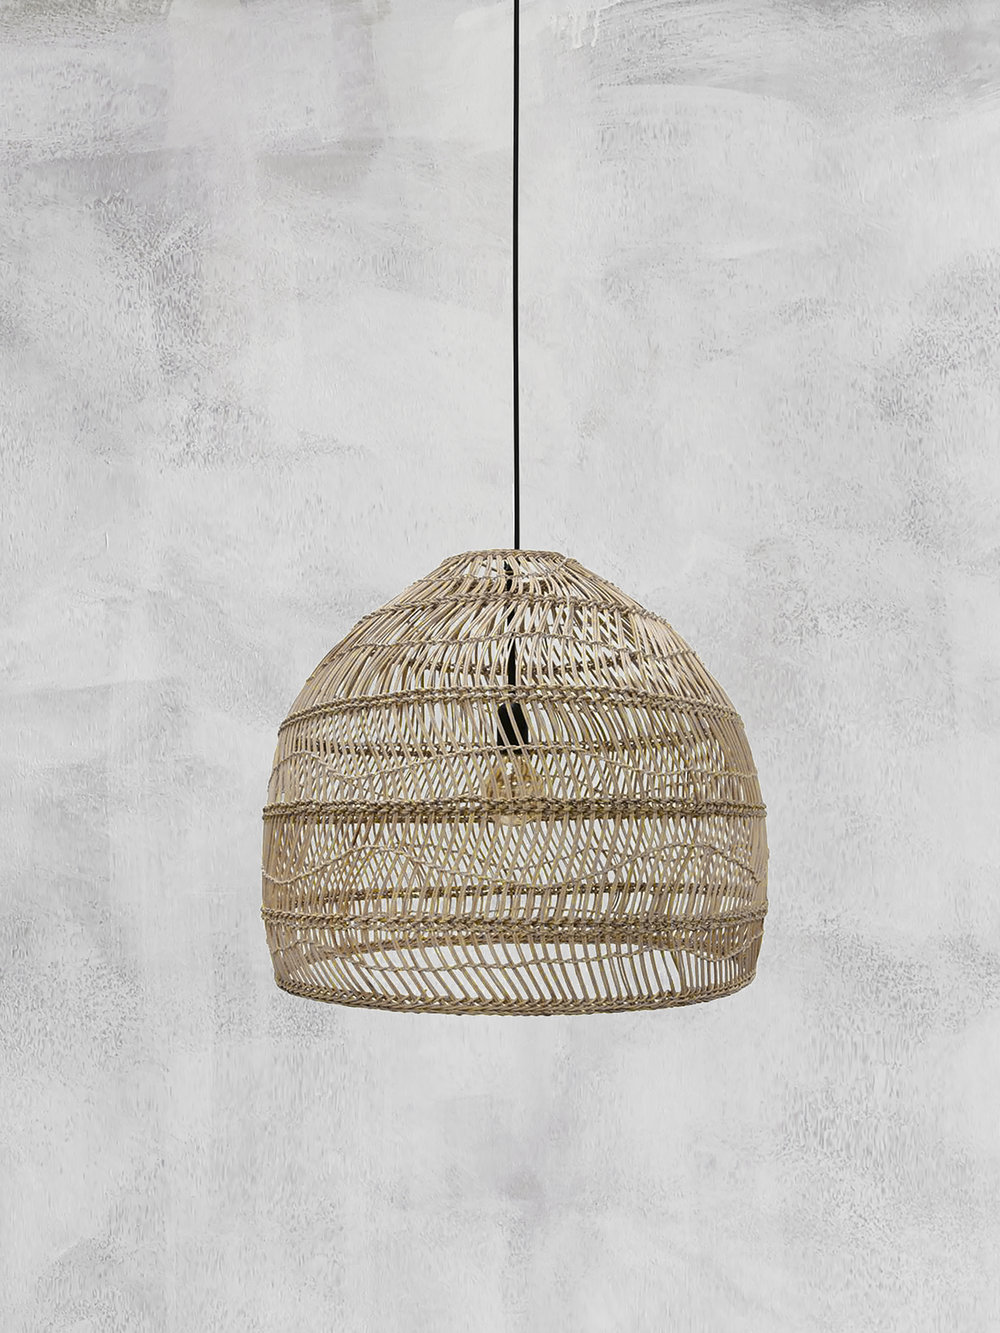 ADORE_house_of_orange_medium_round_wicker_hanging_lamp_natural.jpg